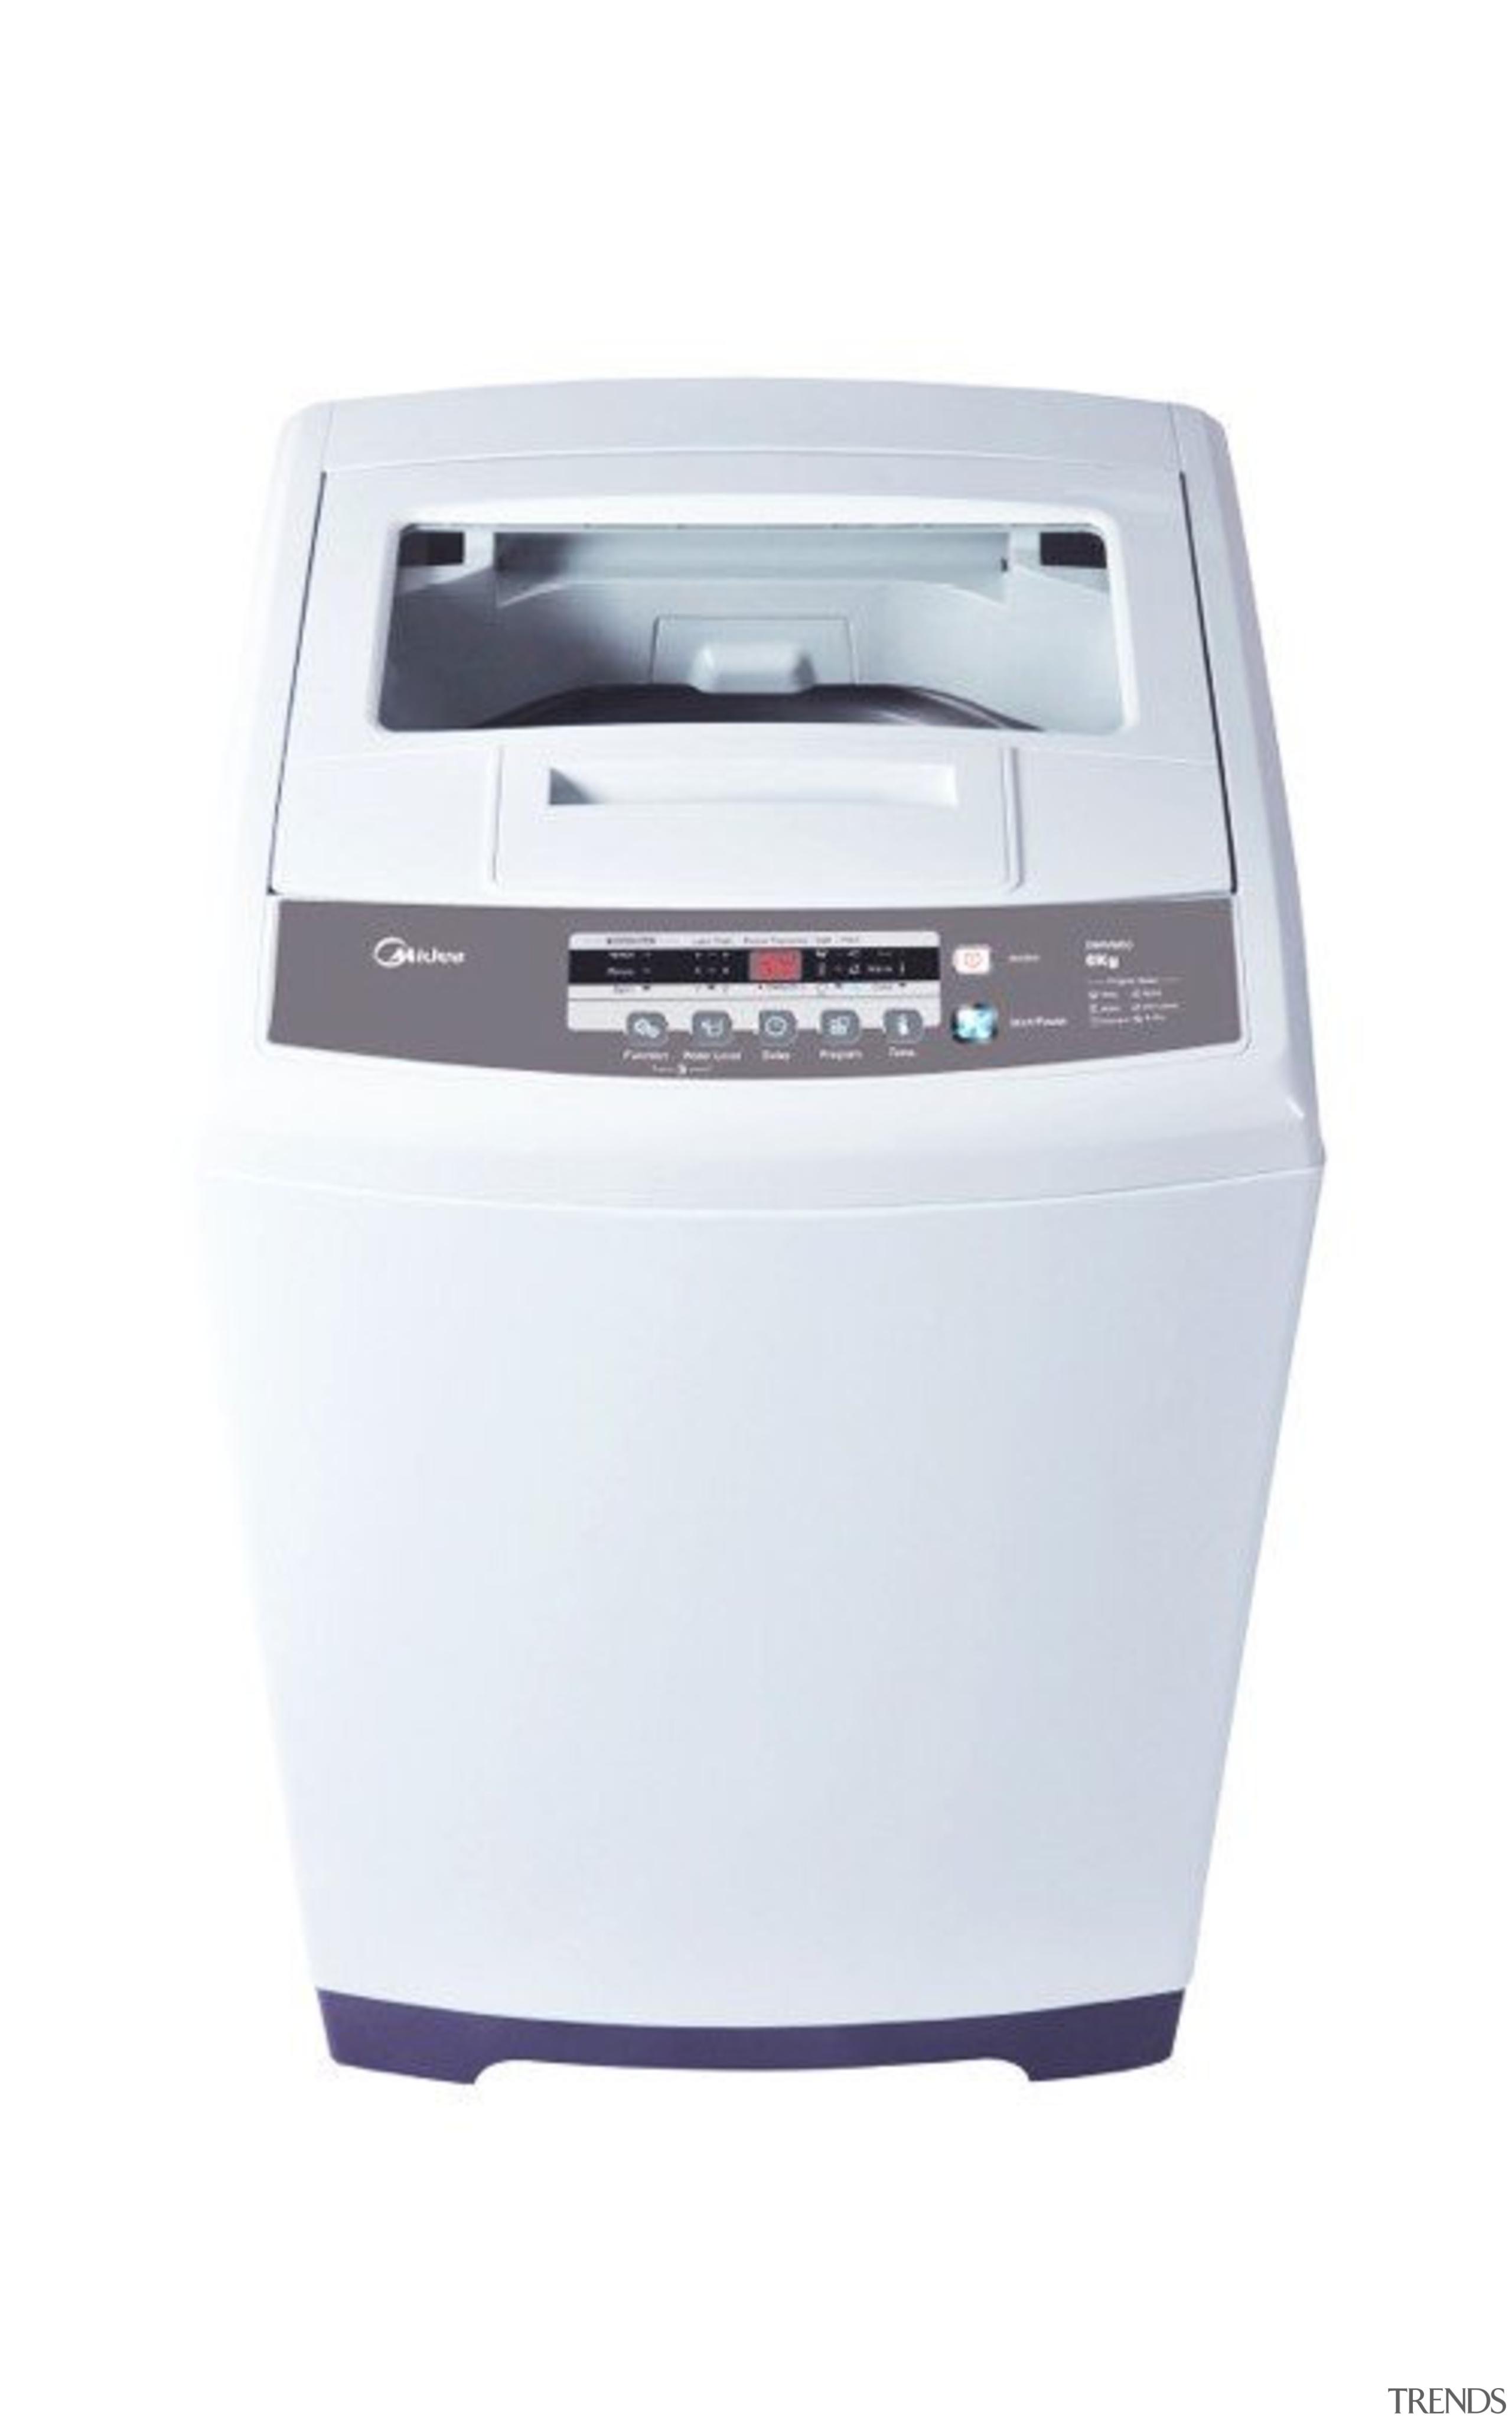 9.5 Kg Top Load Washing MachineCapacity: 9.5Kg6 Programs, home appliance, laser printing, major appliance, product, washing machine, white